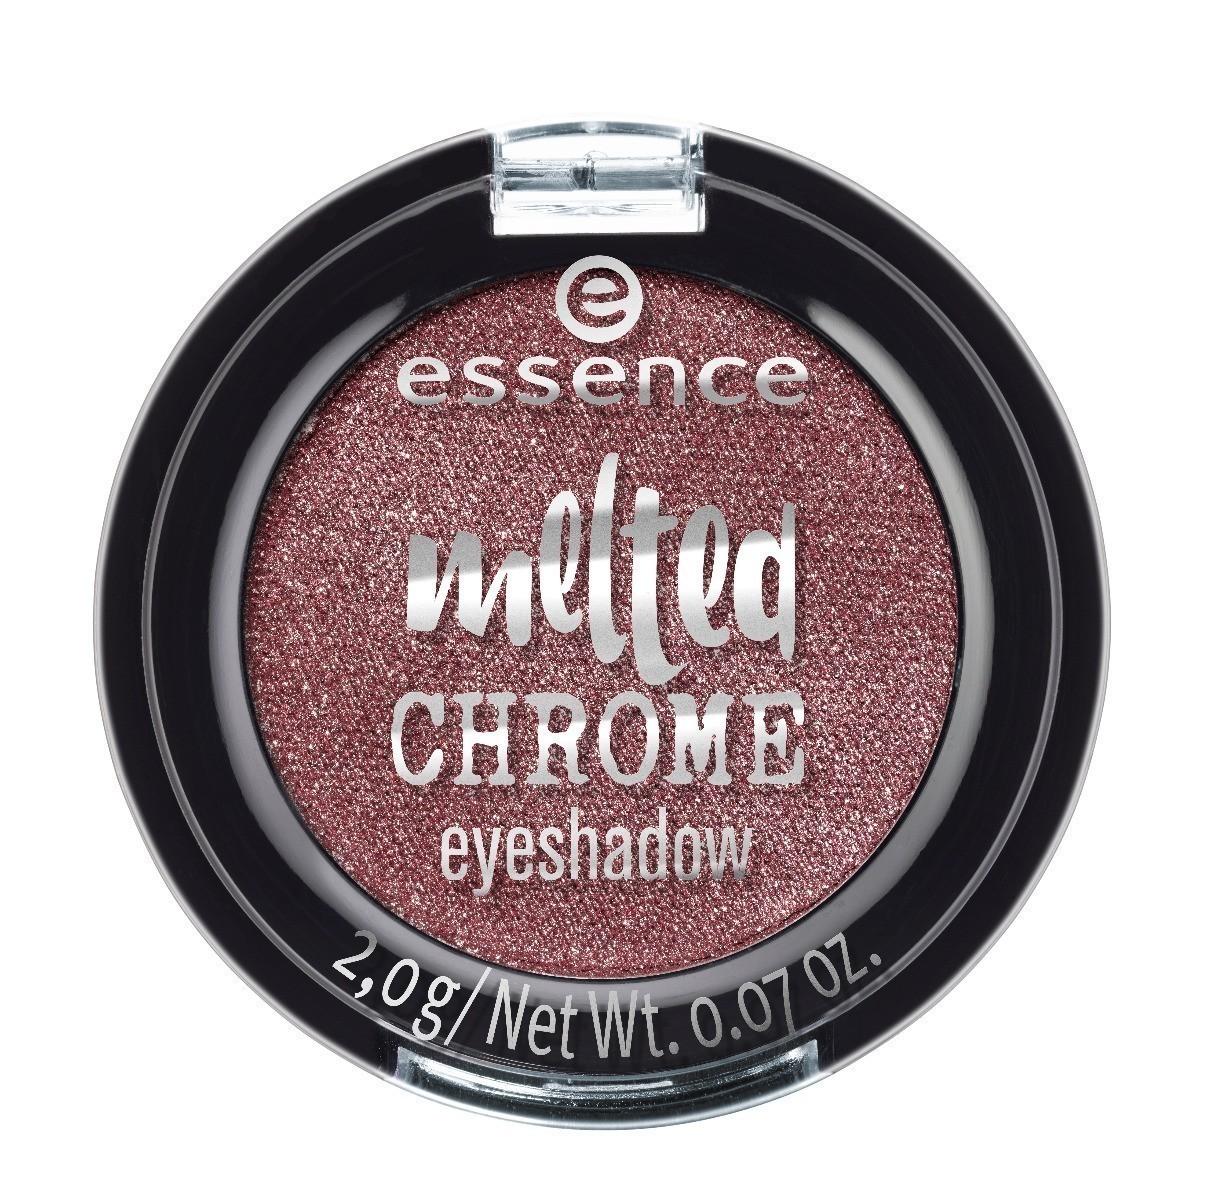 Essence Melted Chrome